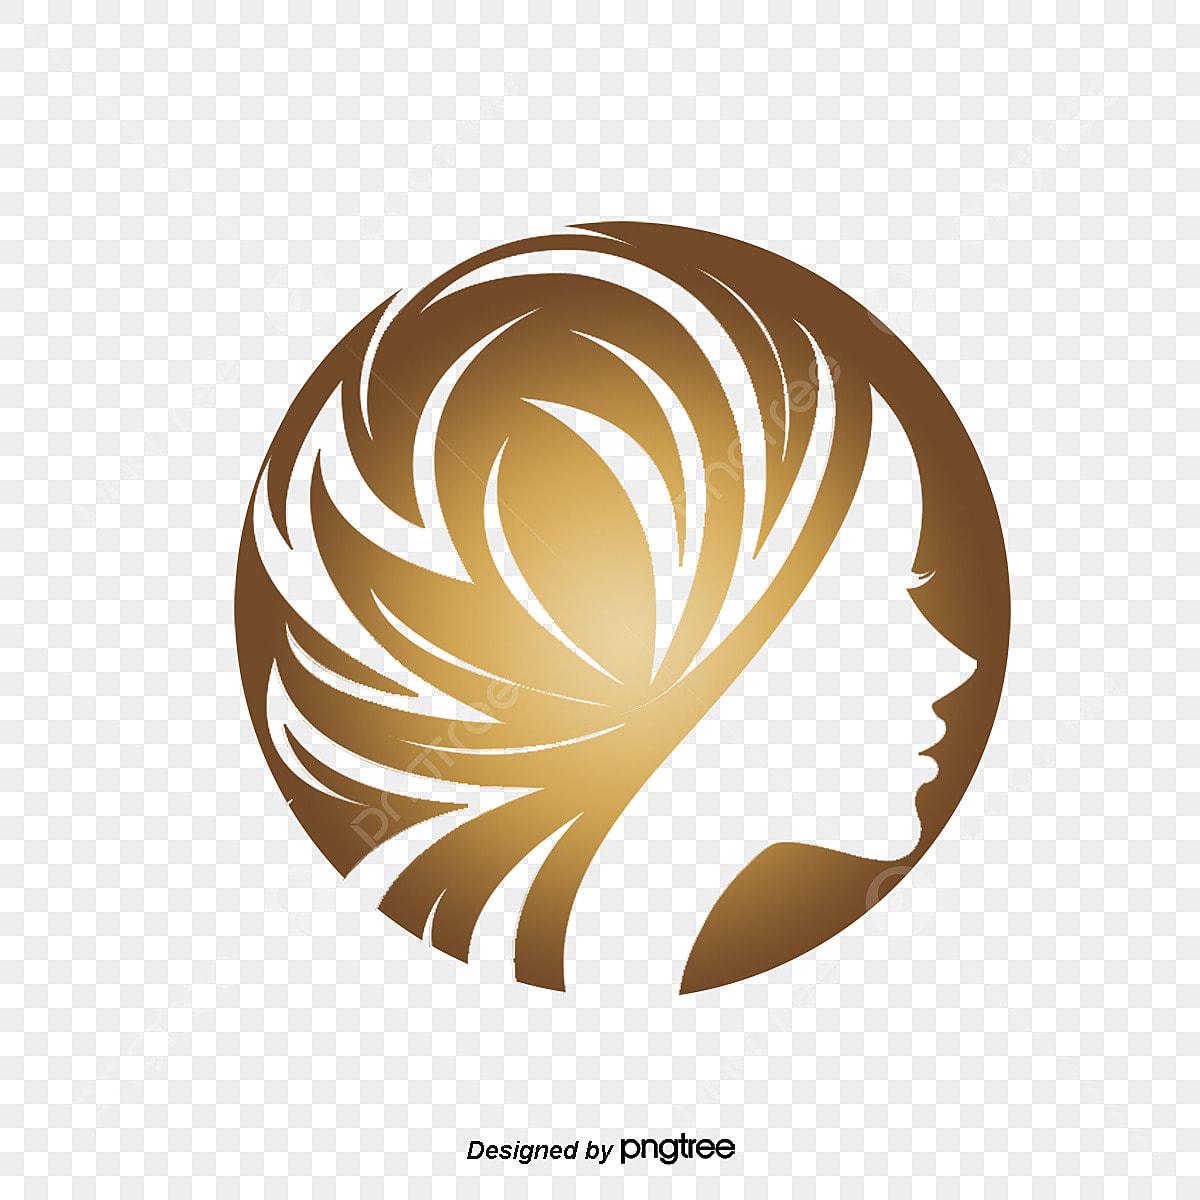 A Estetica Png Images Vetores E Arquivos Psd Download Gratis